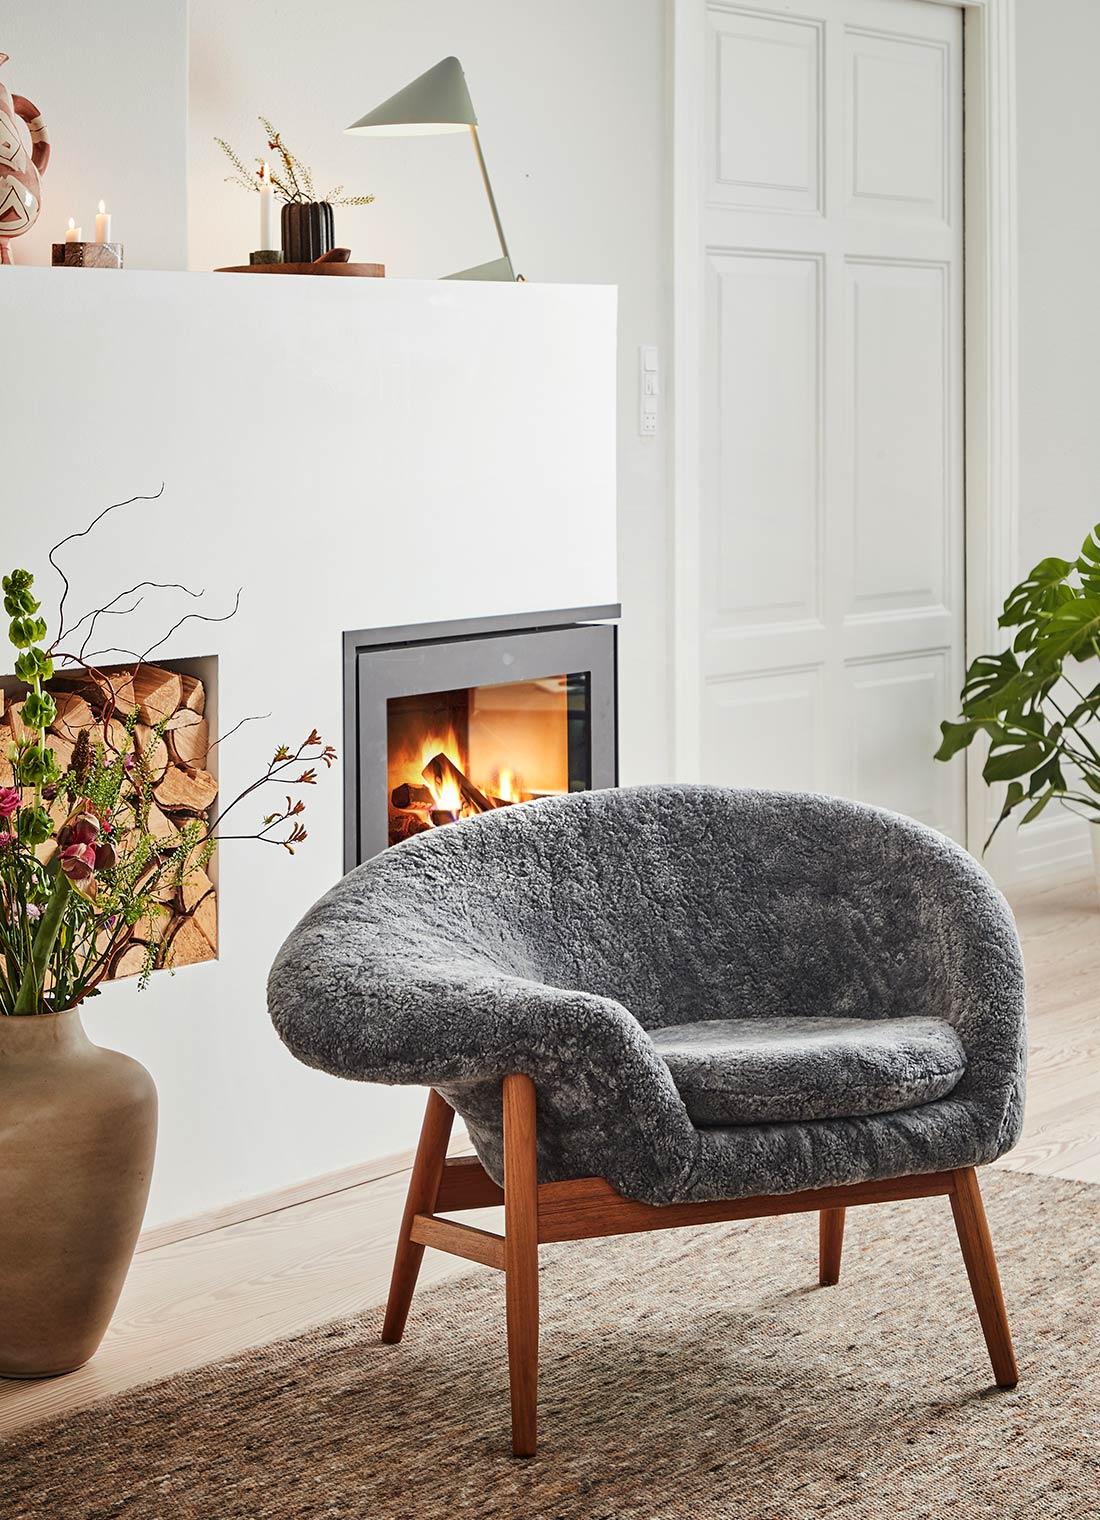 Warm Nordic/ウォームノルディック/Fried Egg Sheepラウンジチェア